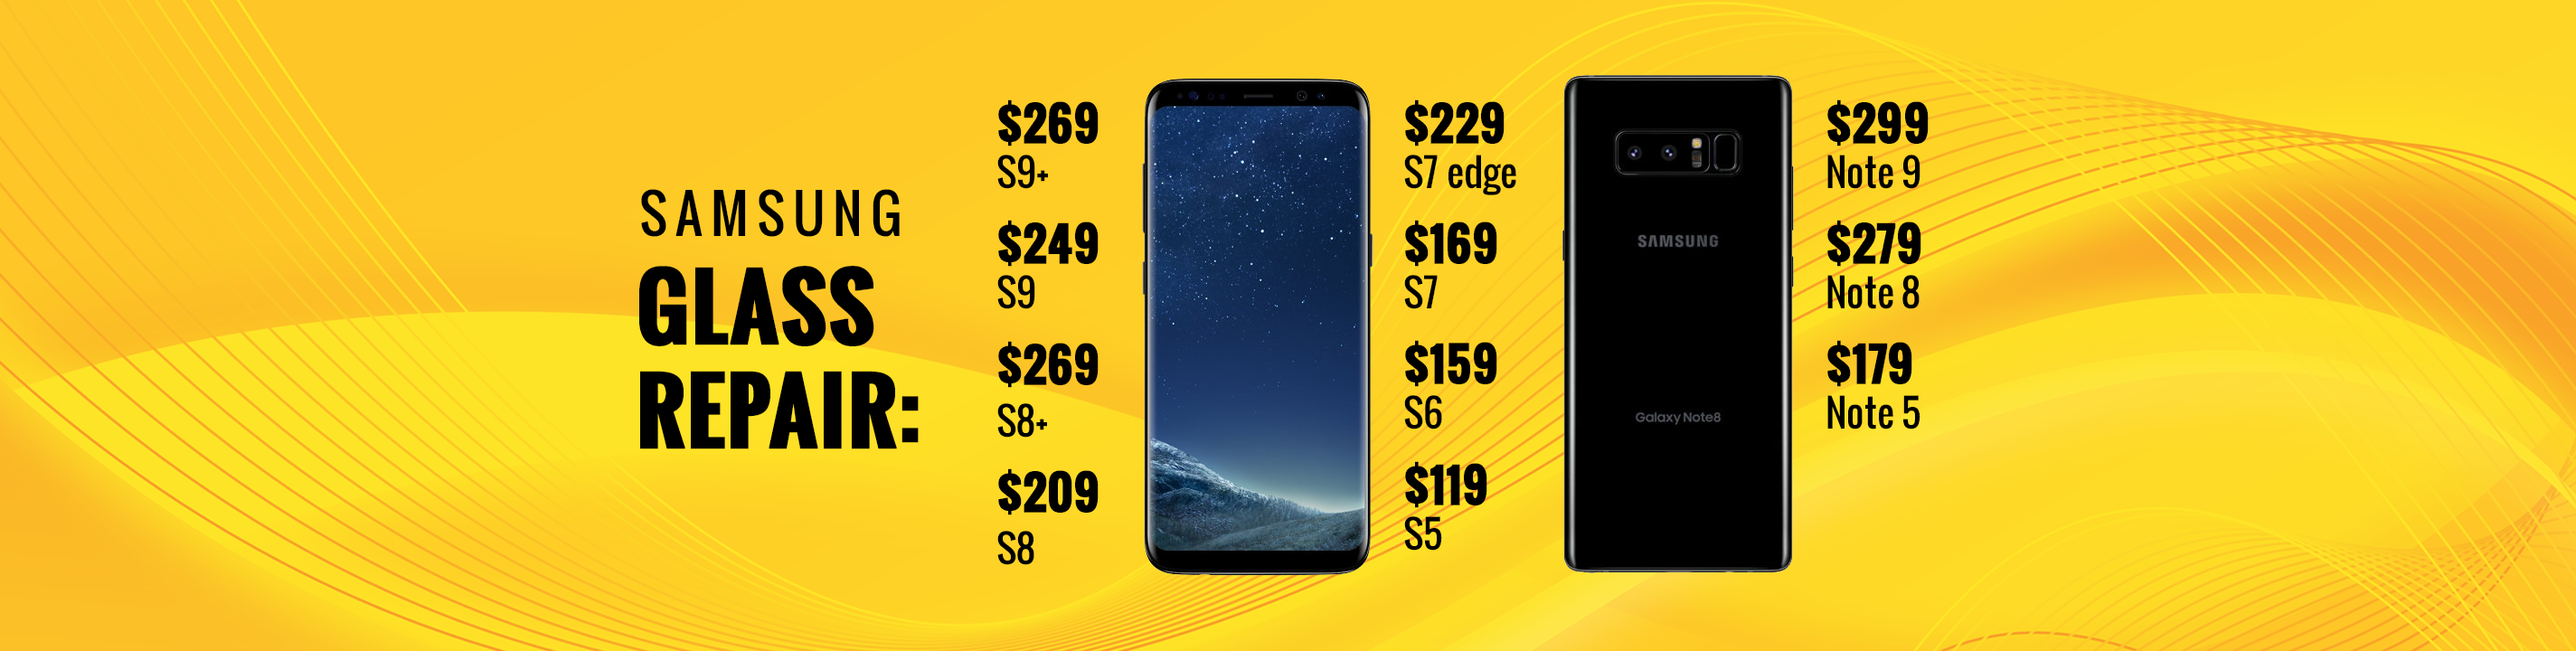 samsung-pricing-banner-2.5.19